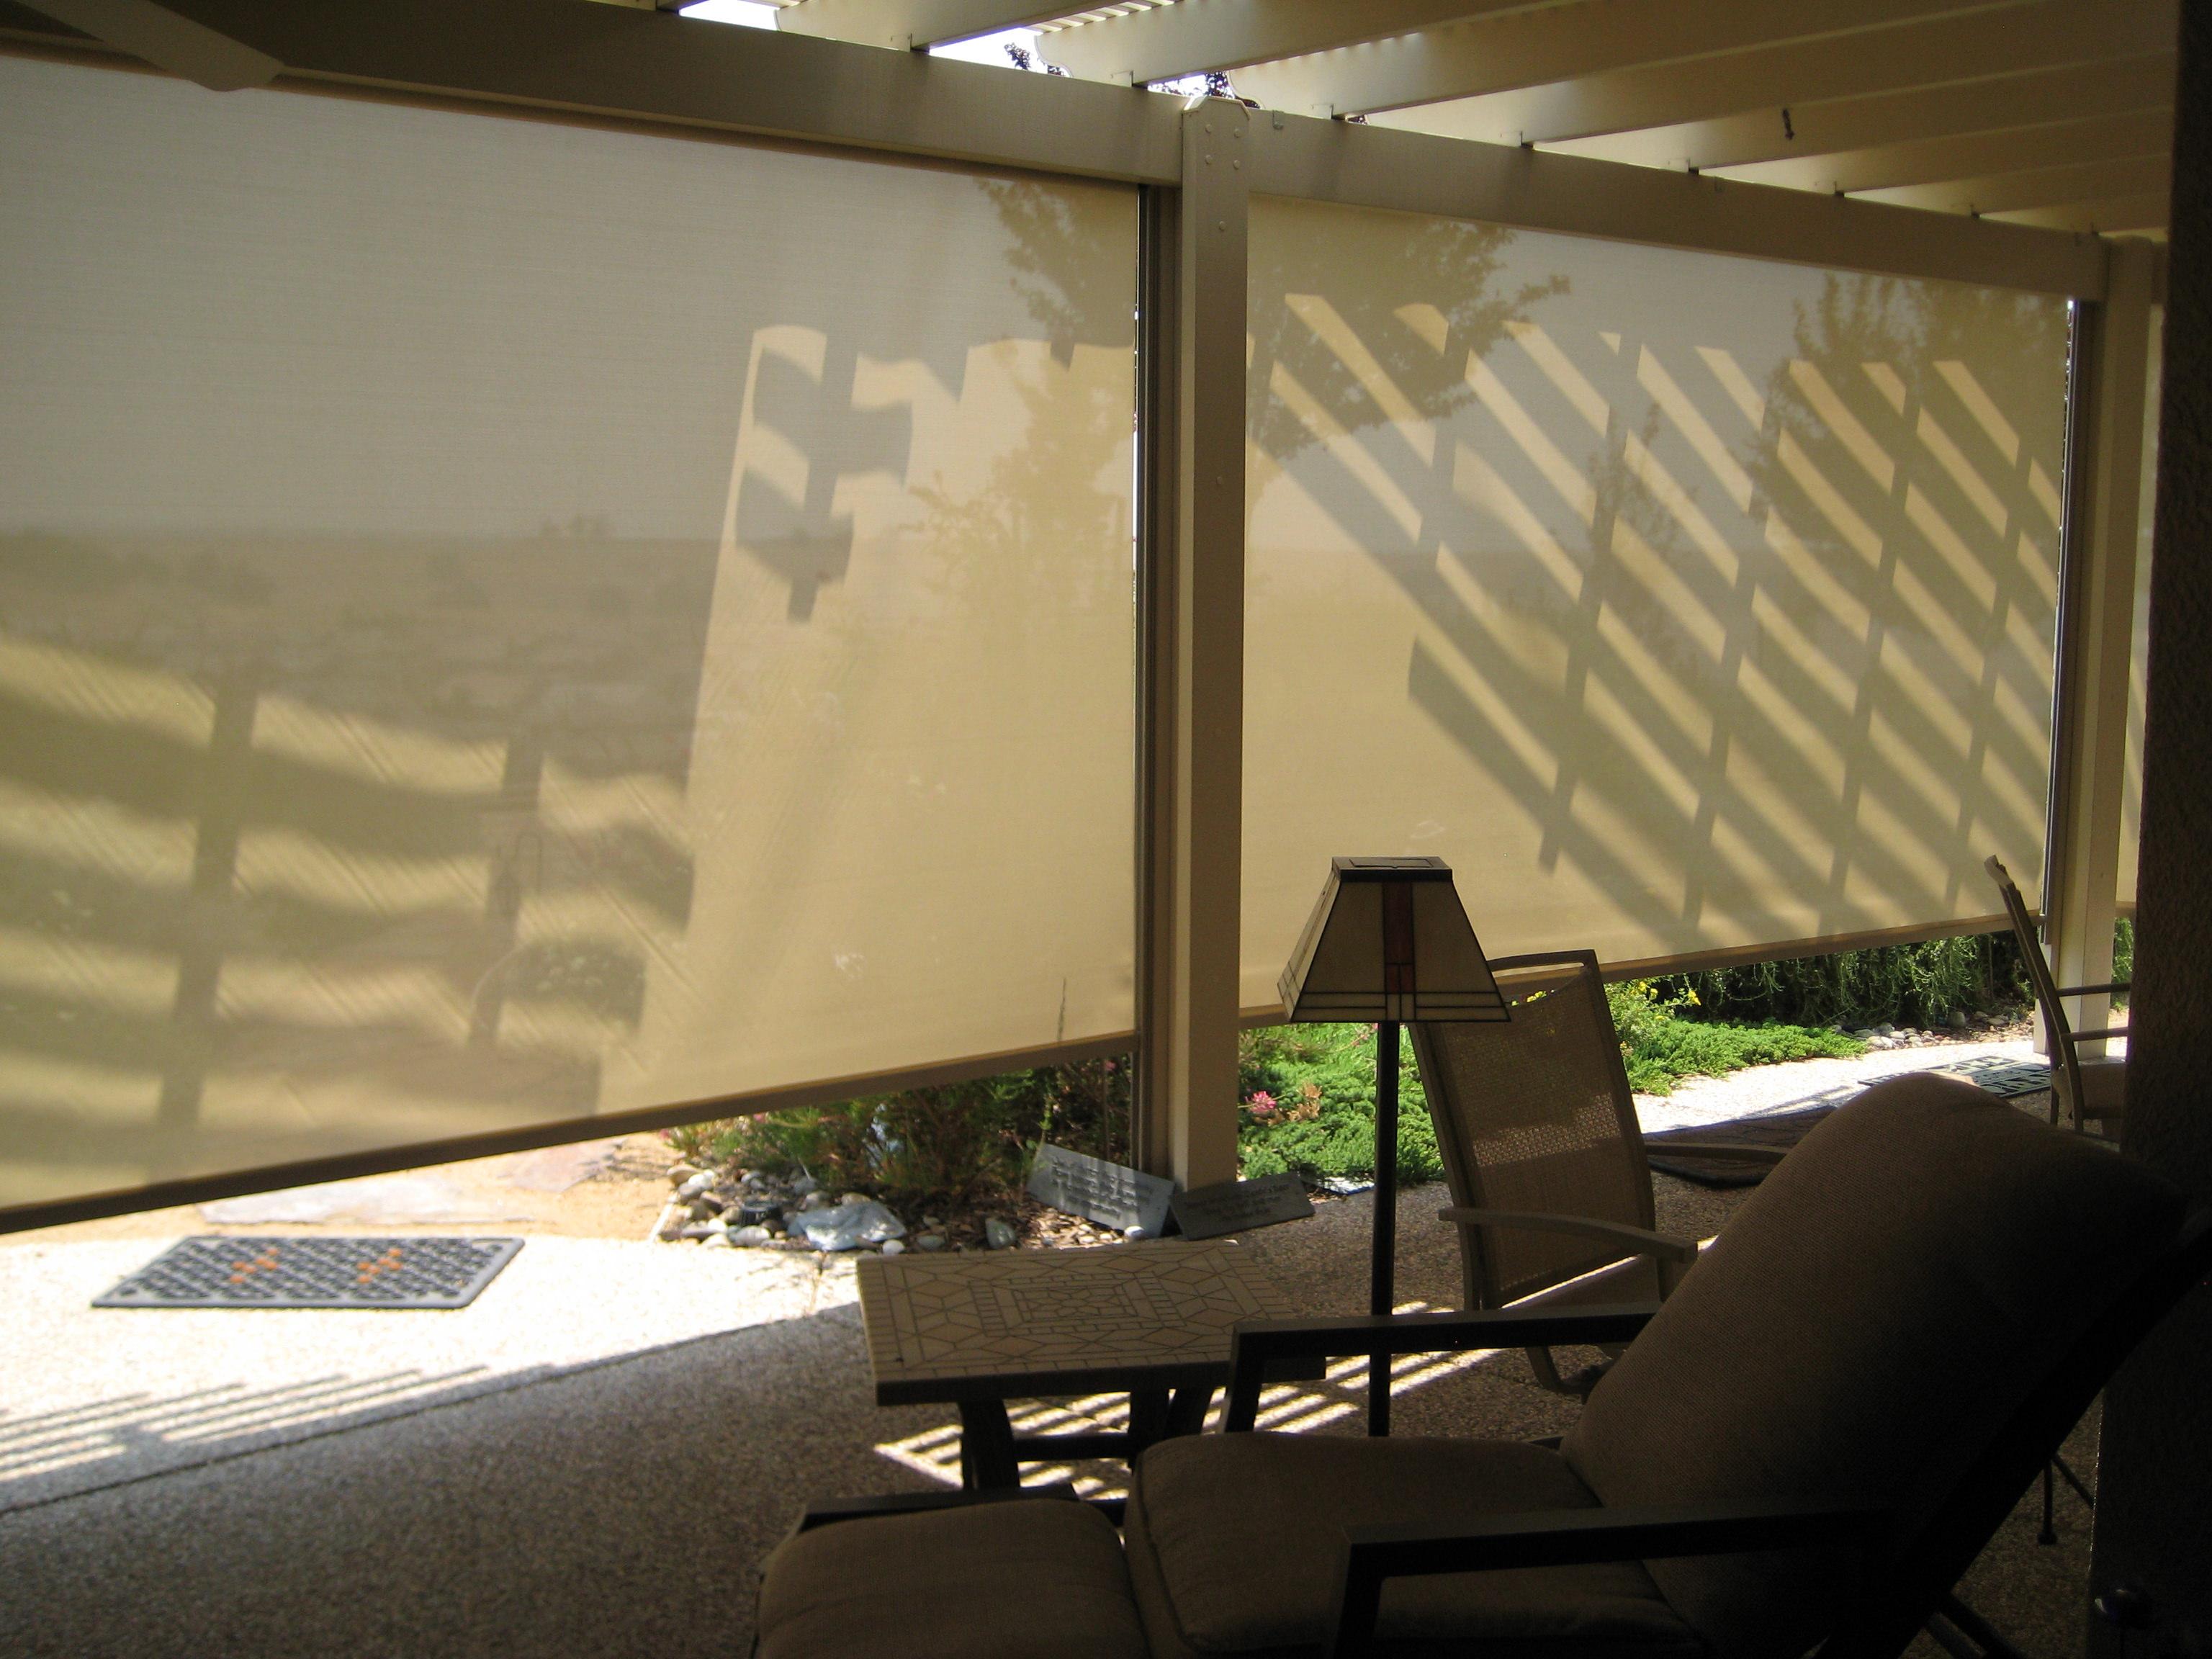 Sun Blinds Plus